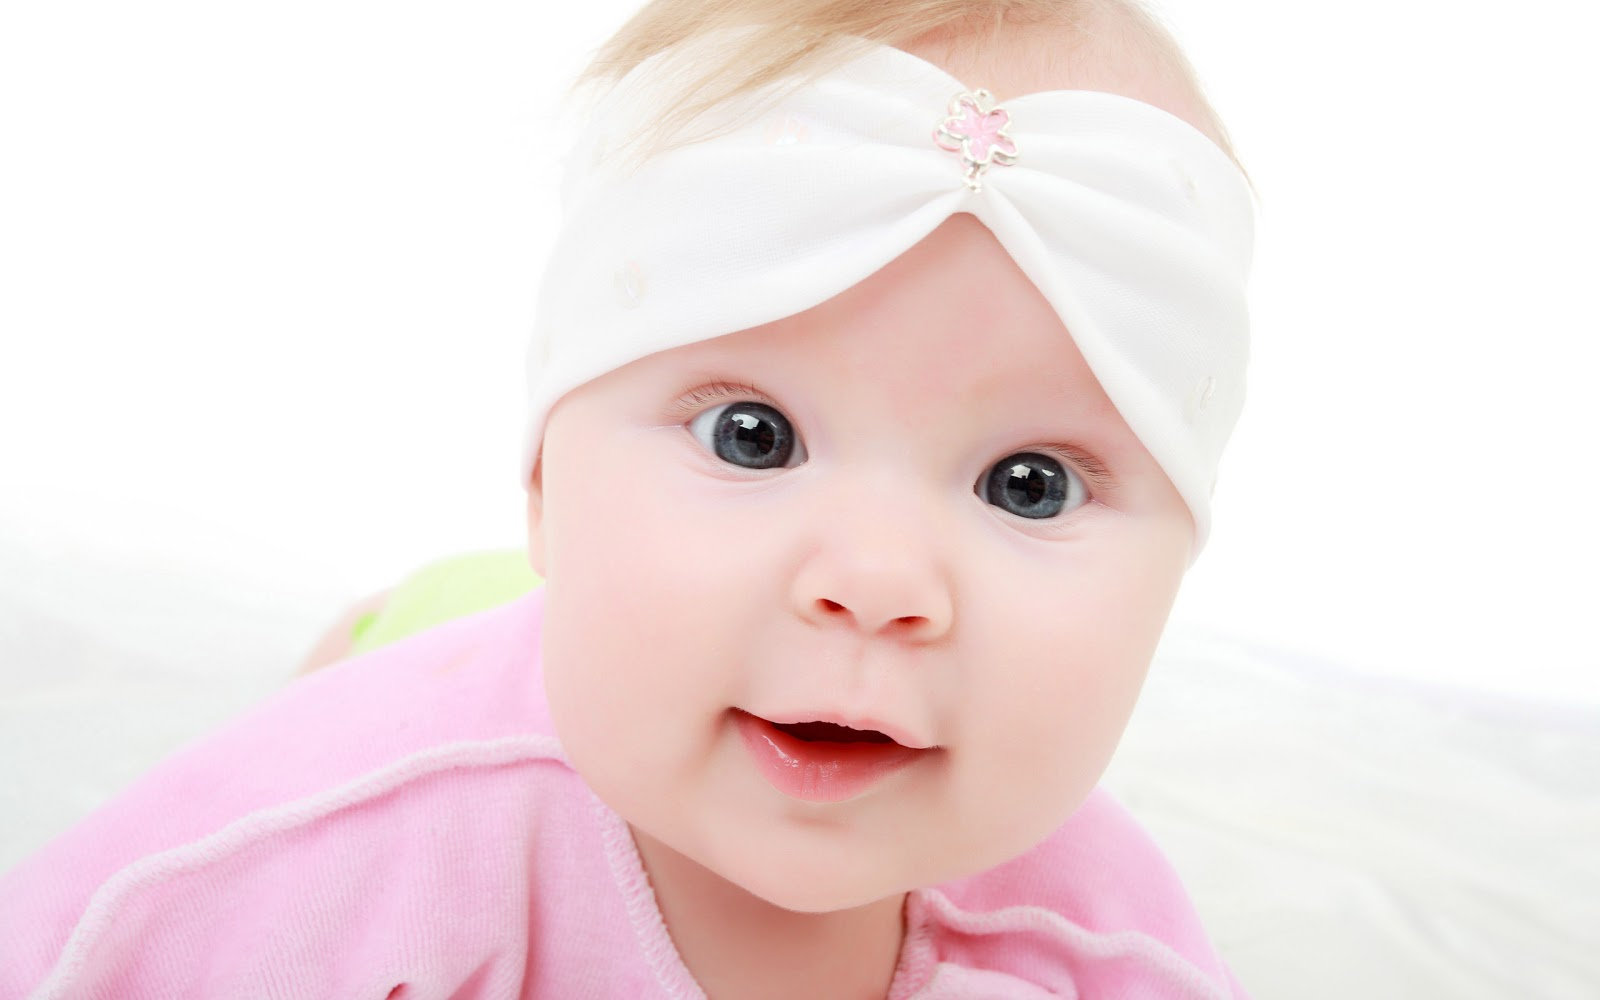 http://2.bp.blogspot.com/-9ta1448mkso/UNuxaEyK_lI/AAAAAAAAAYU/MXIZqS7ewTQ/s1600/Smiling-Baby.jpg